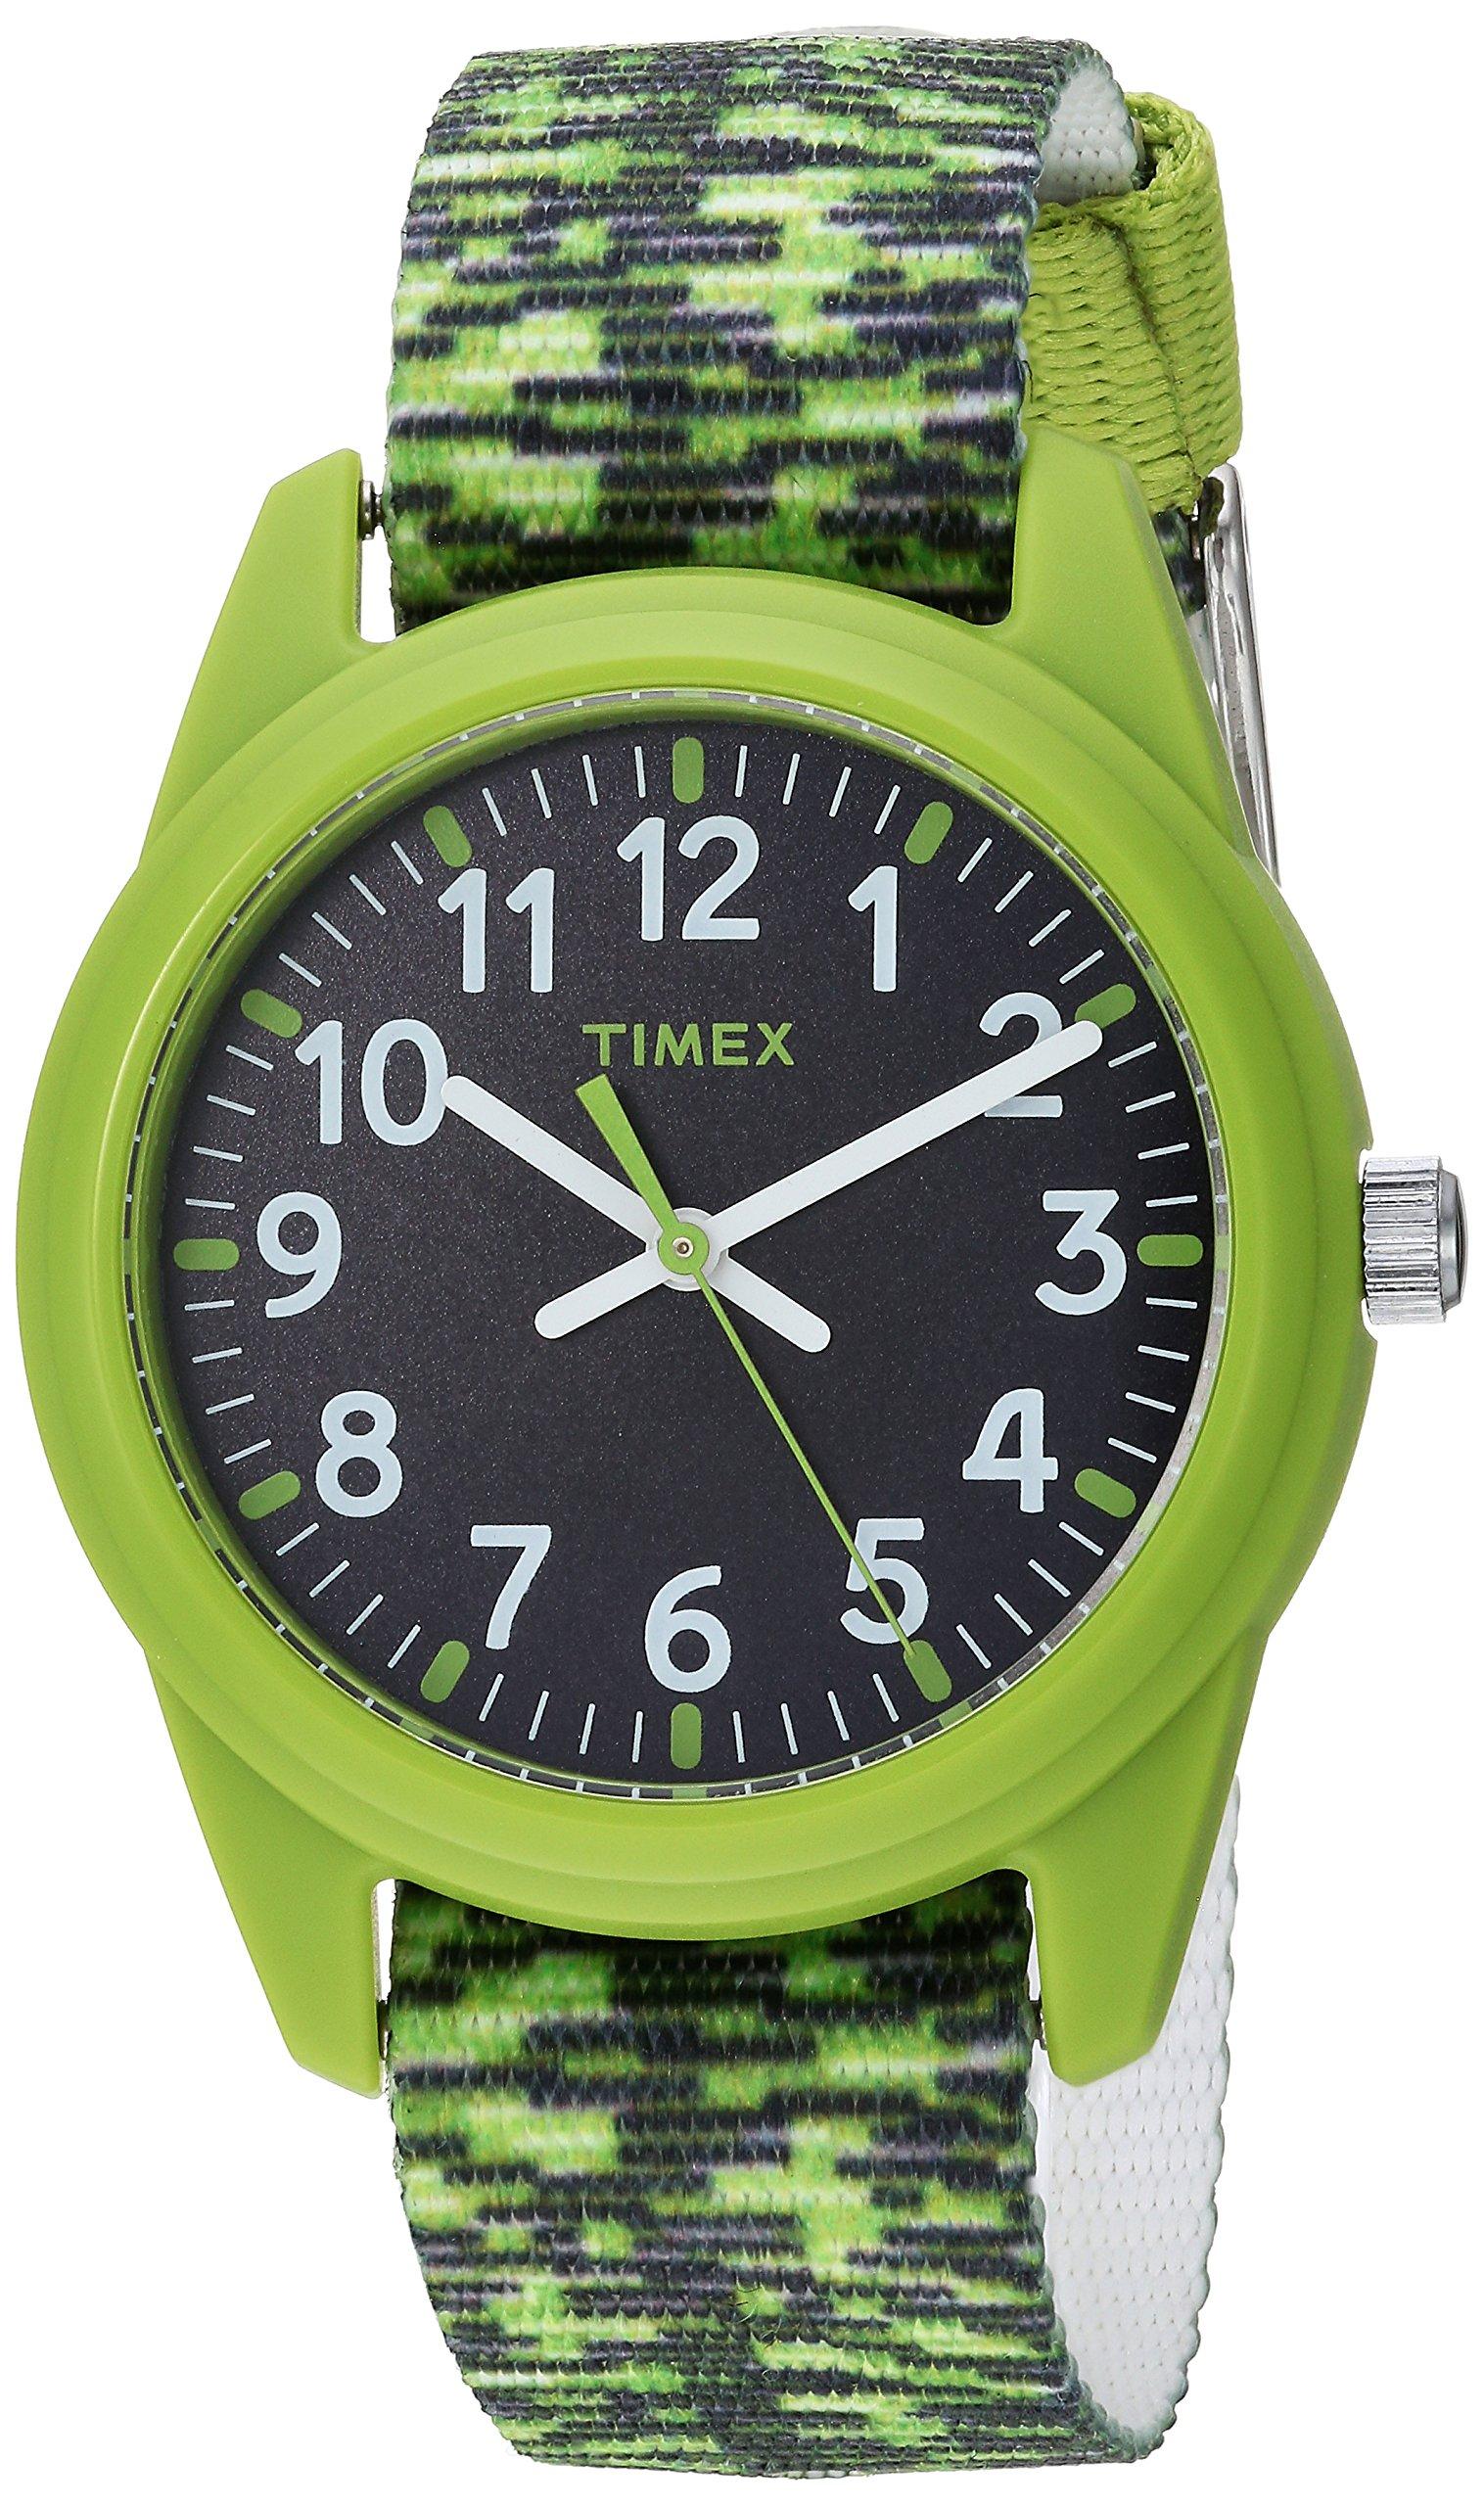 Timex Boys TW7C11900 Time Machines Green/Black Sport Elastic Fabric Strap Watch